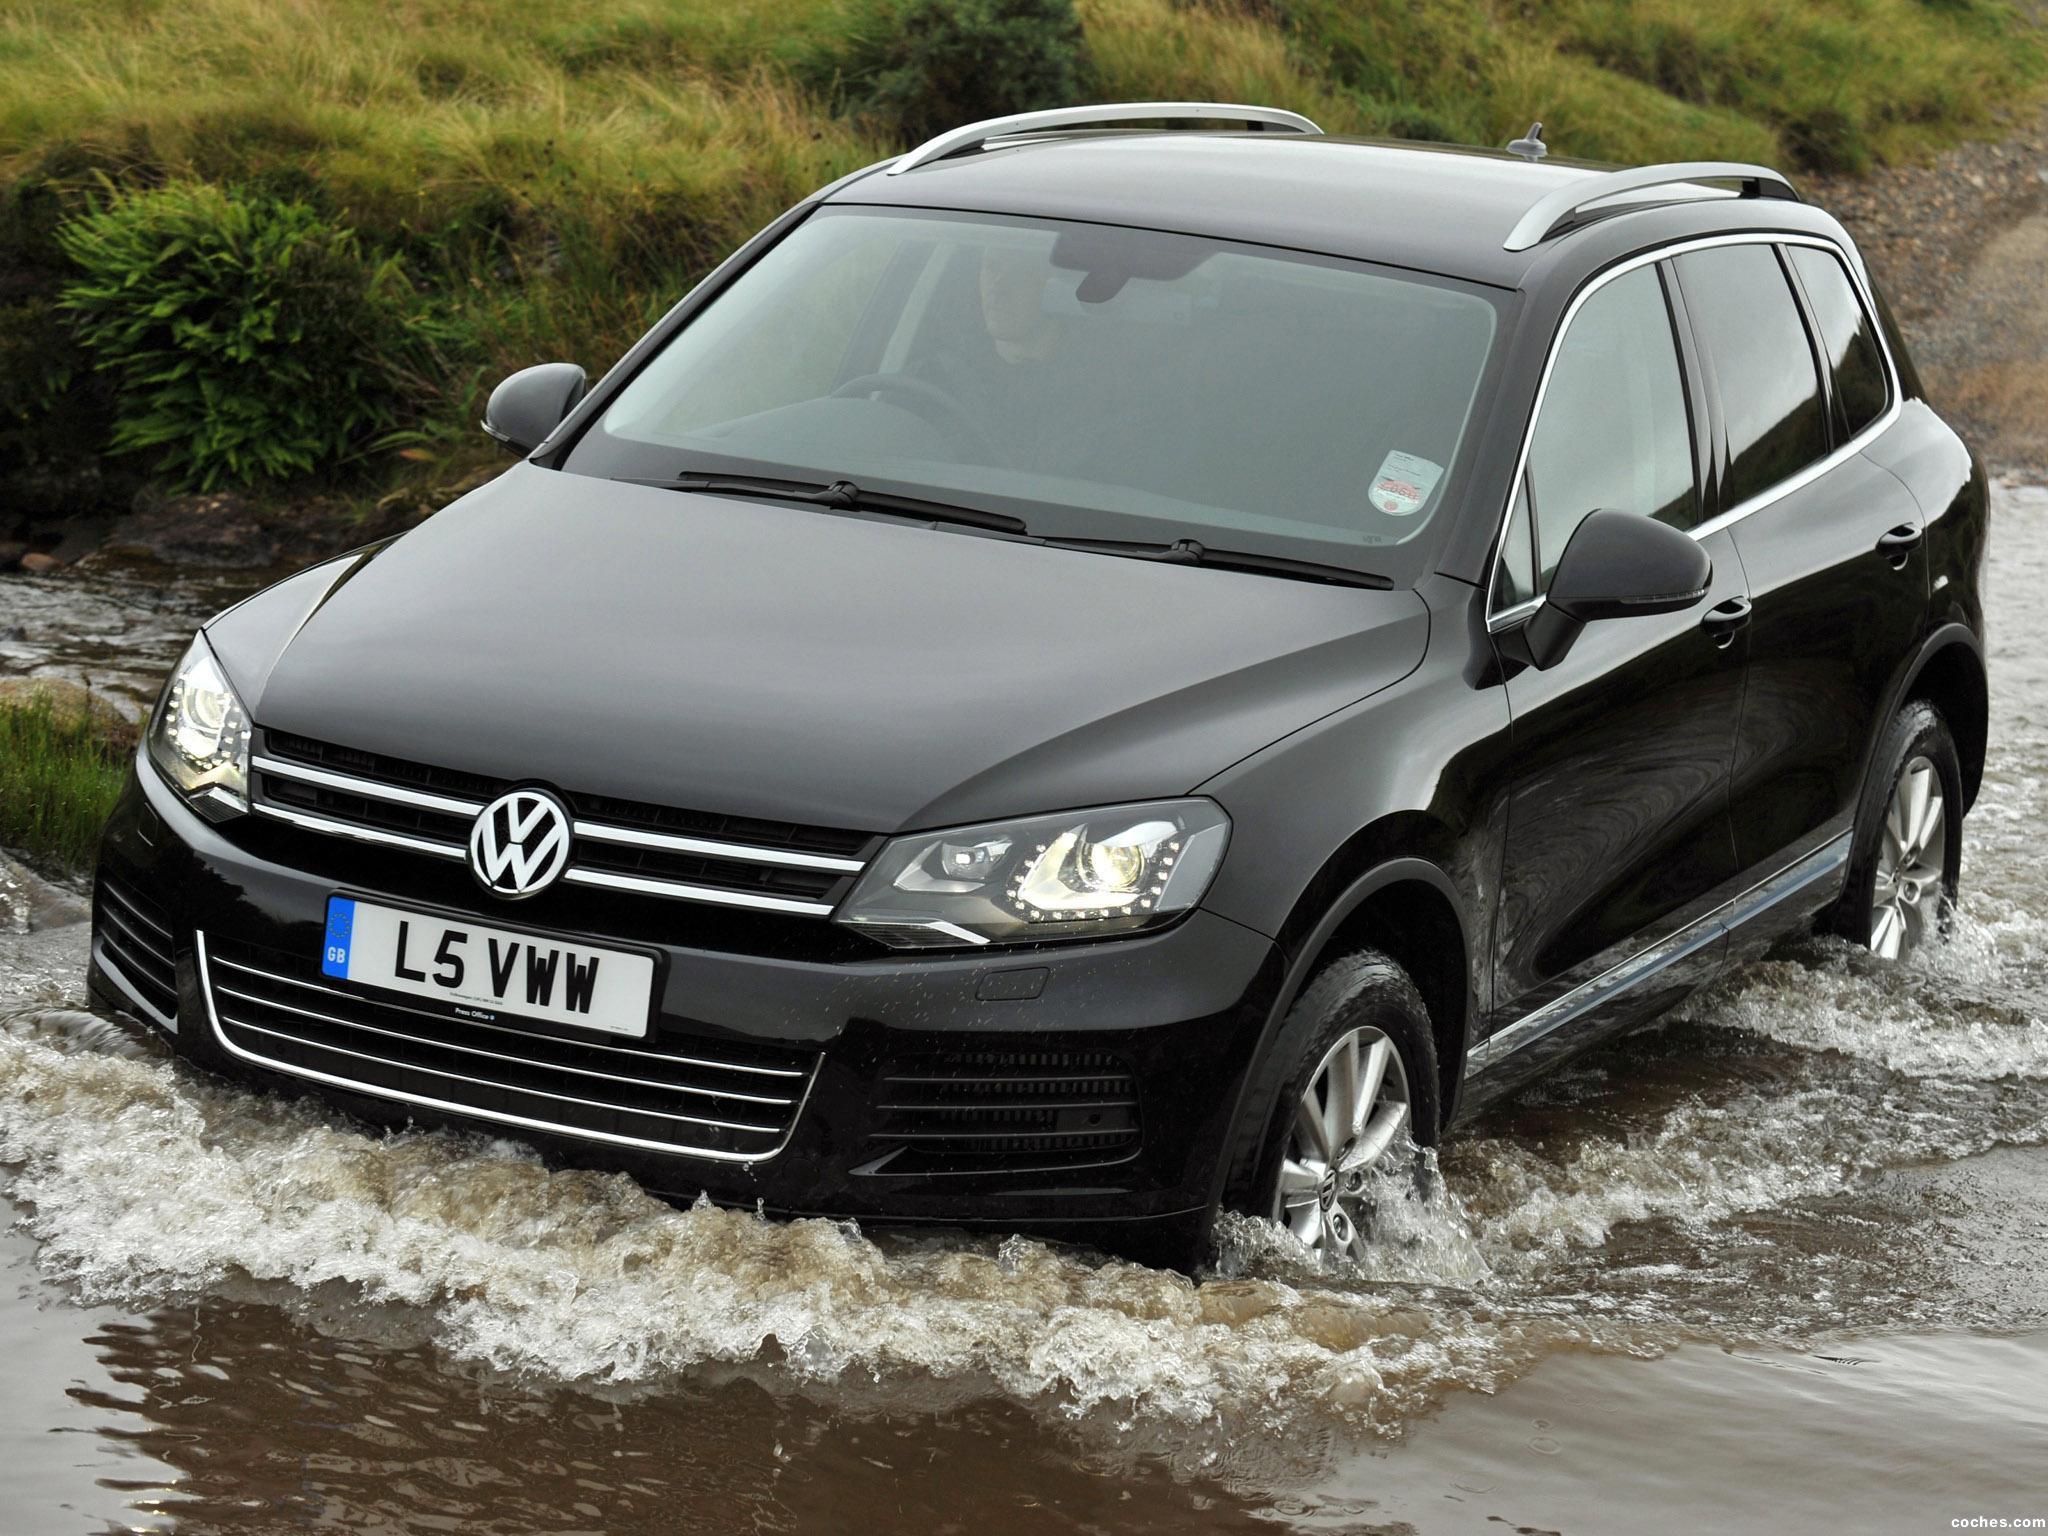 Foto 0 de Volkswagen Touareg V6 TDI UK 2010